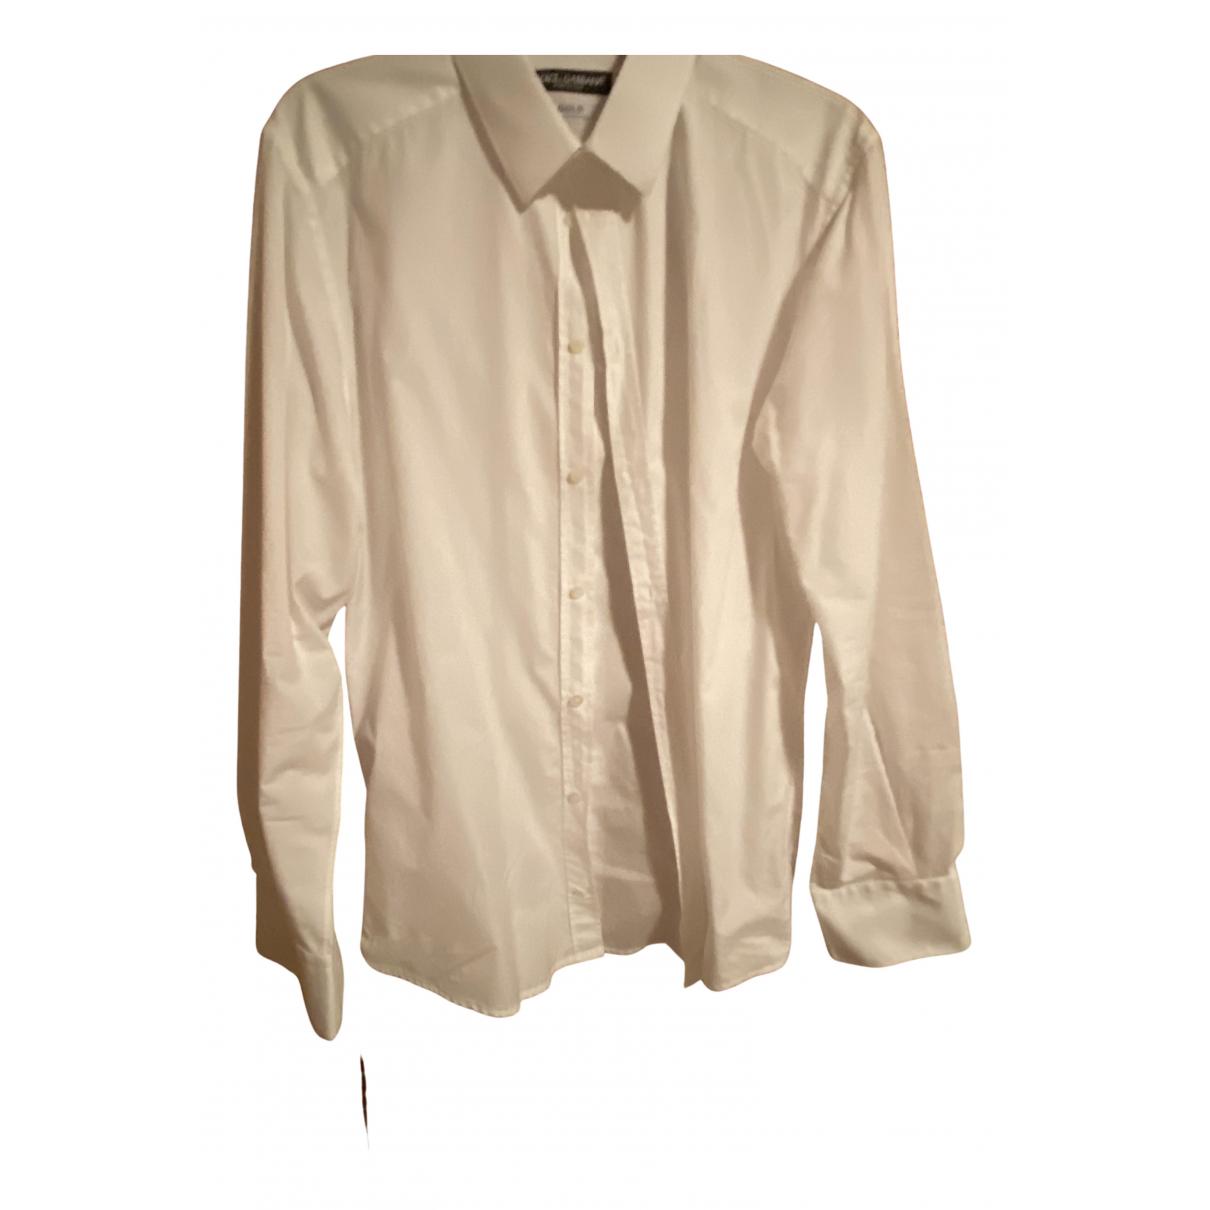 Dolce & Gabbana N White Cotton Shirts for Men 40 EU (tour de cou / collar)